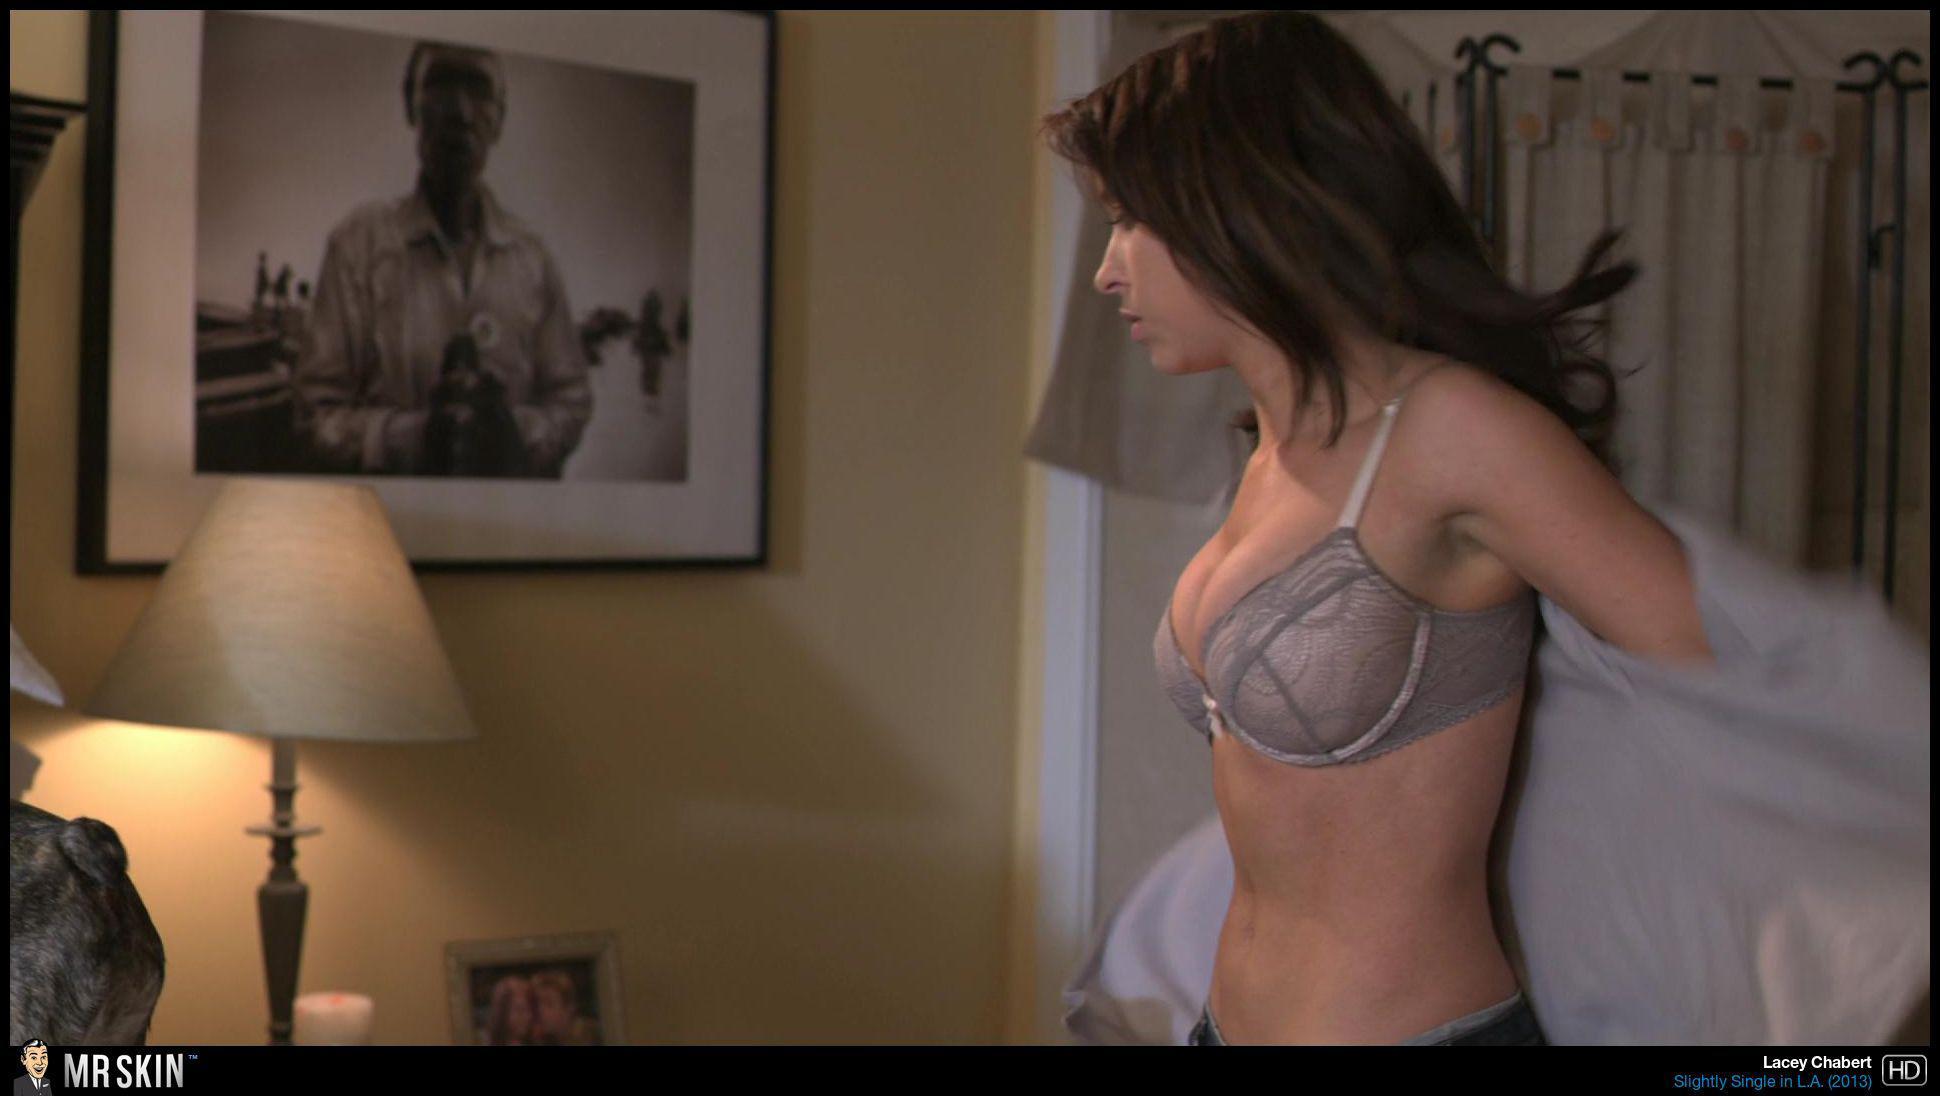 Lacey Chabert Nipples